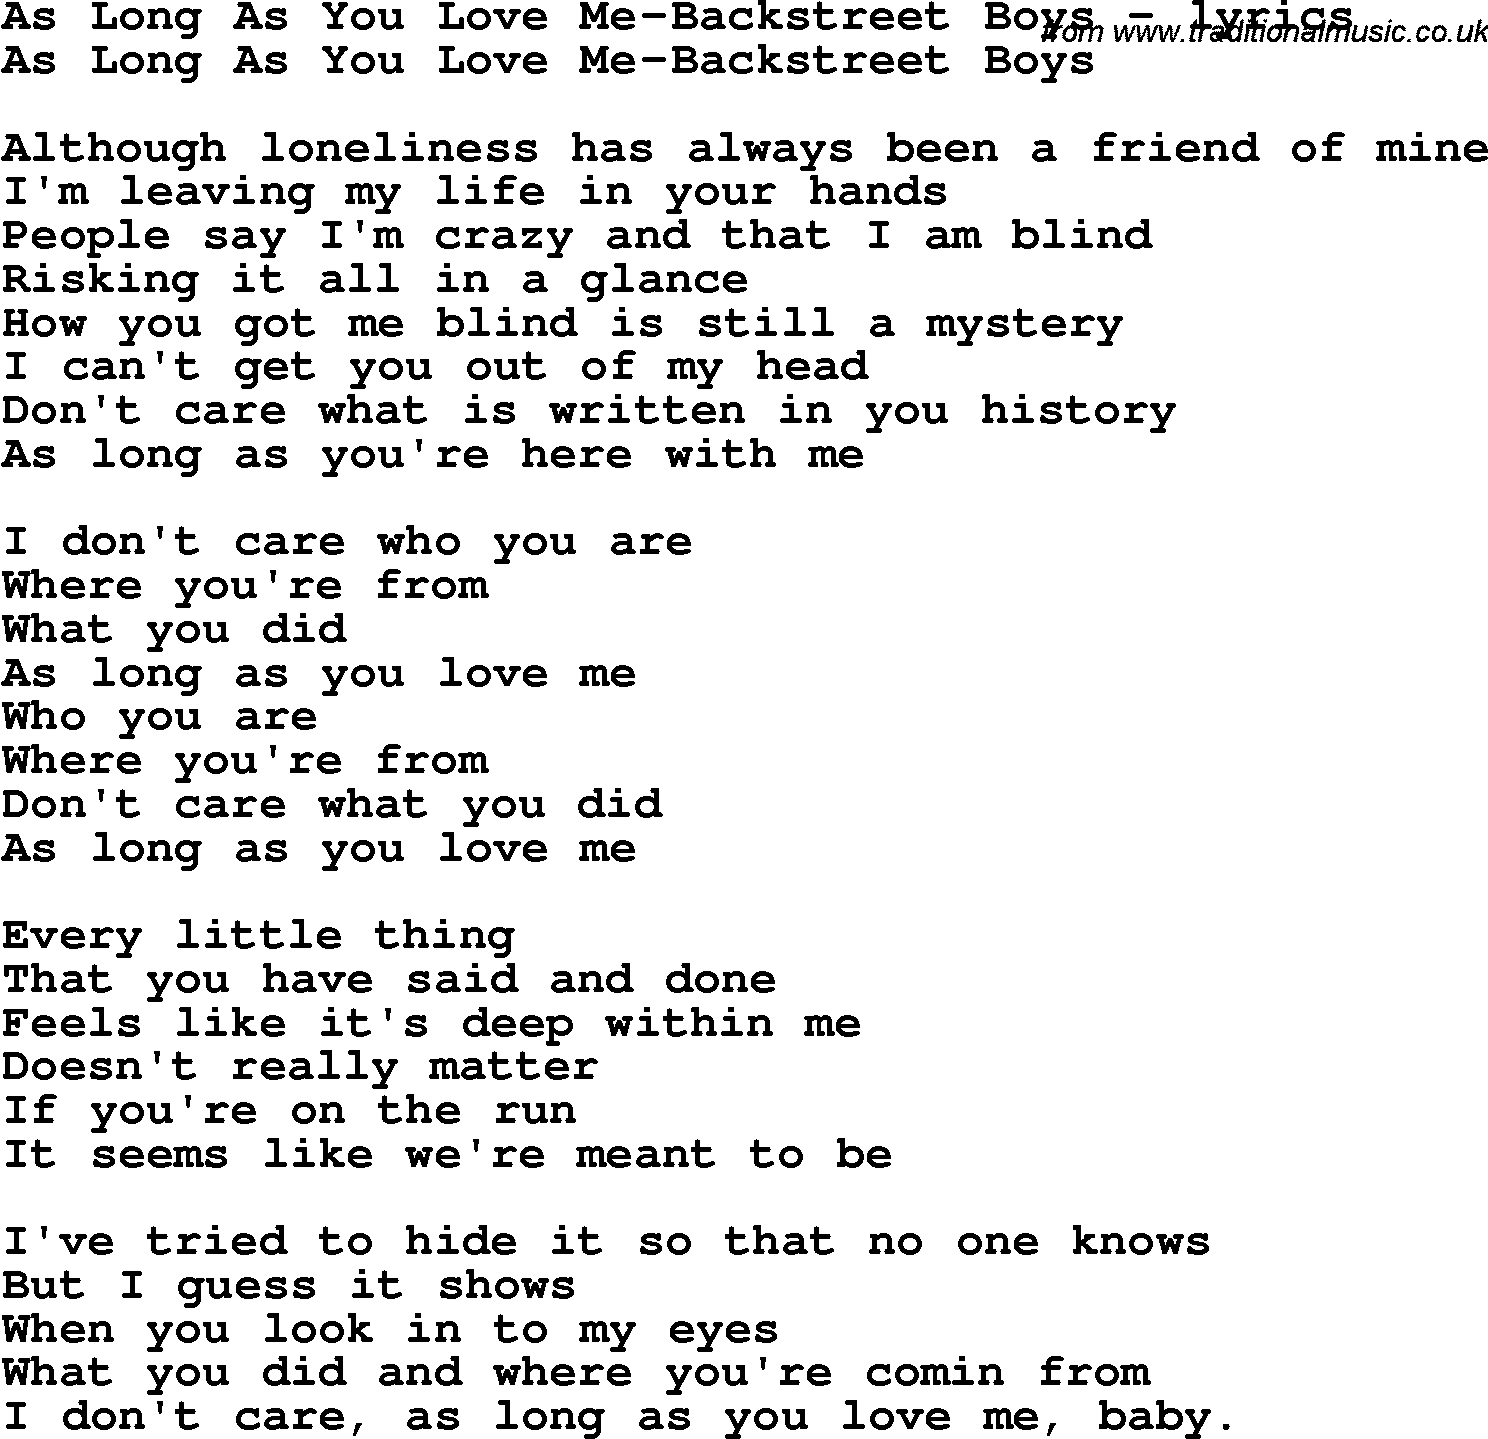 As love as you love me lyrics